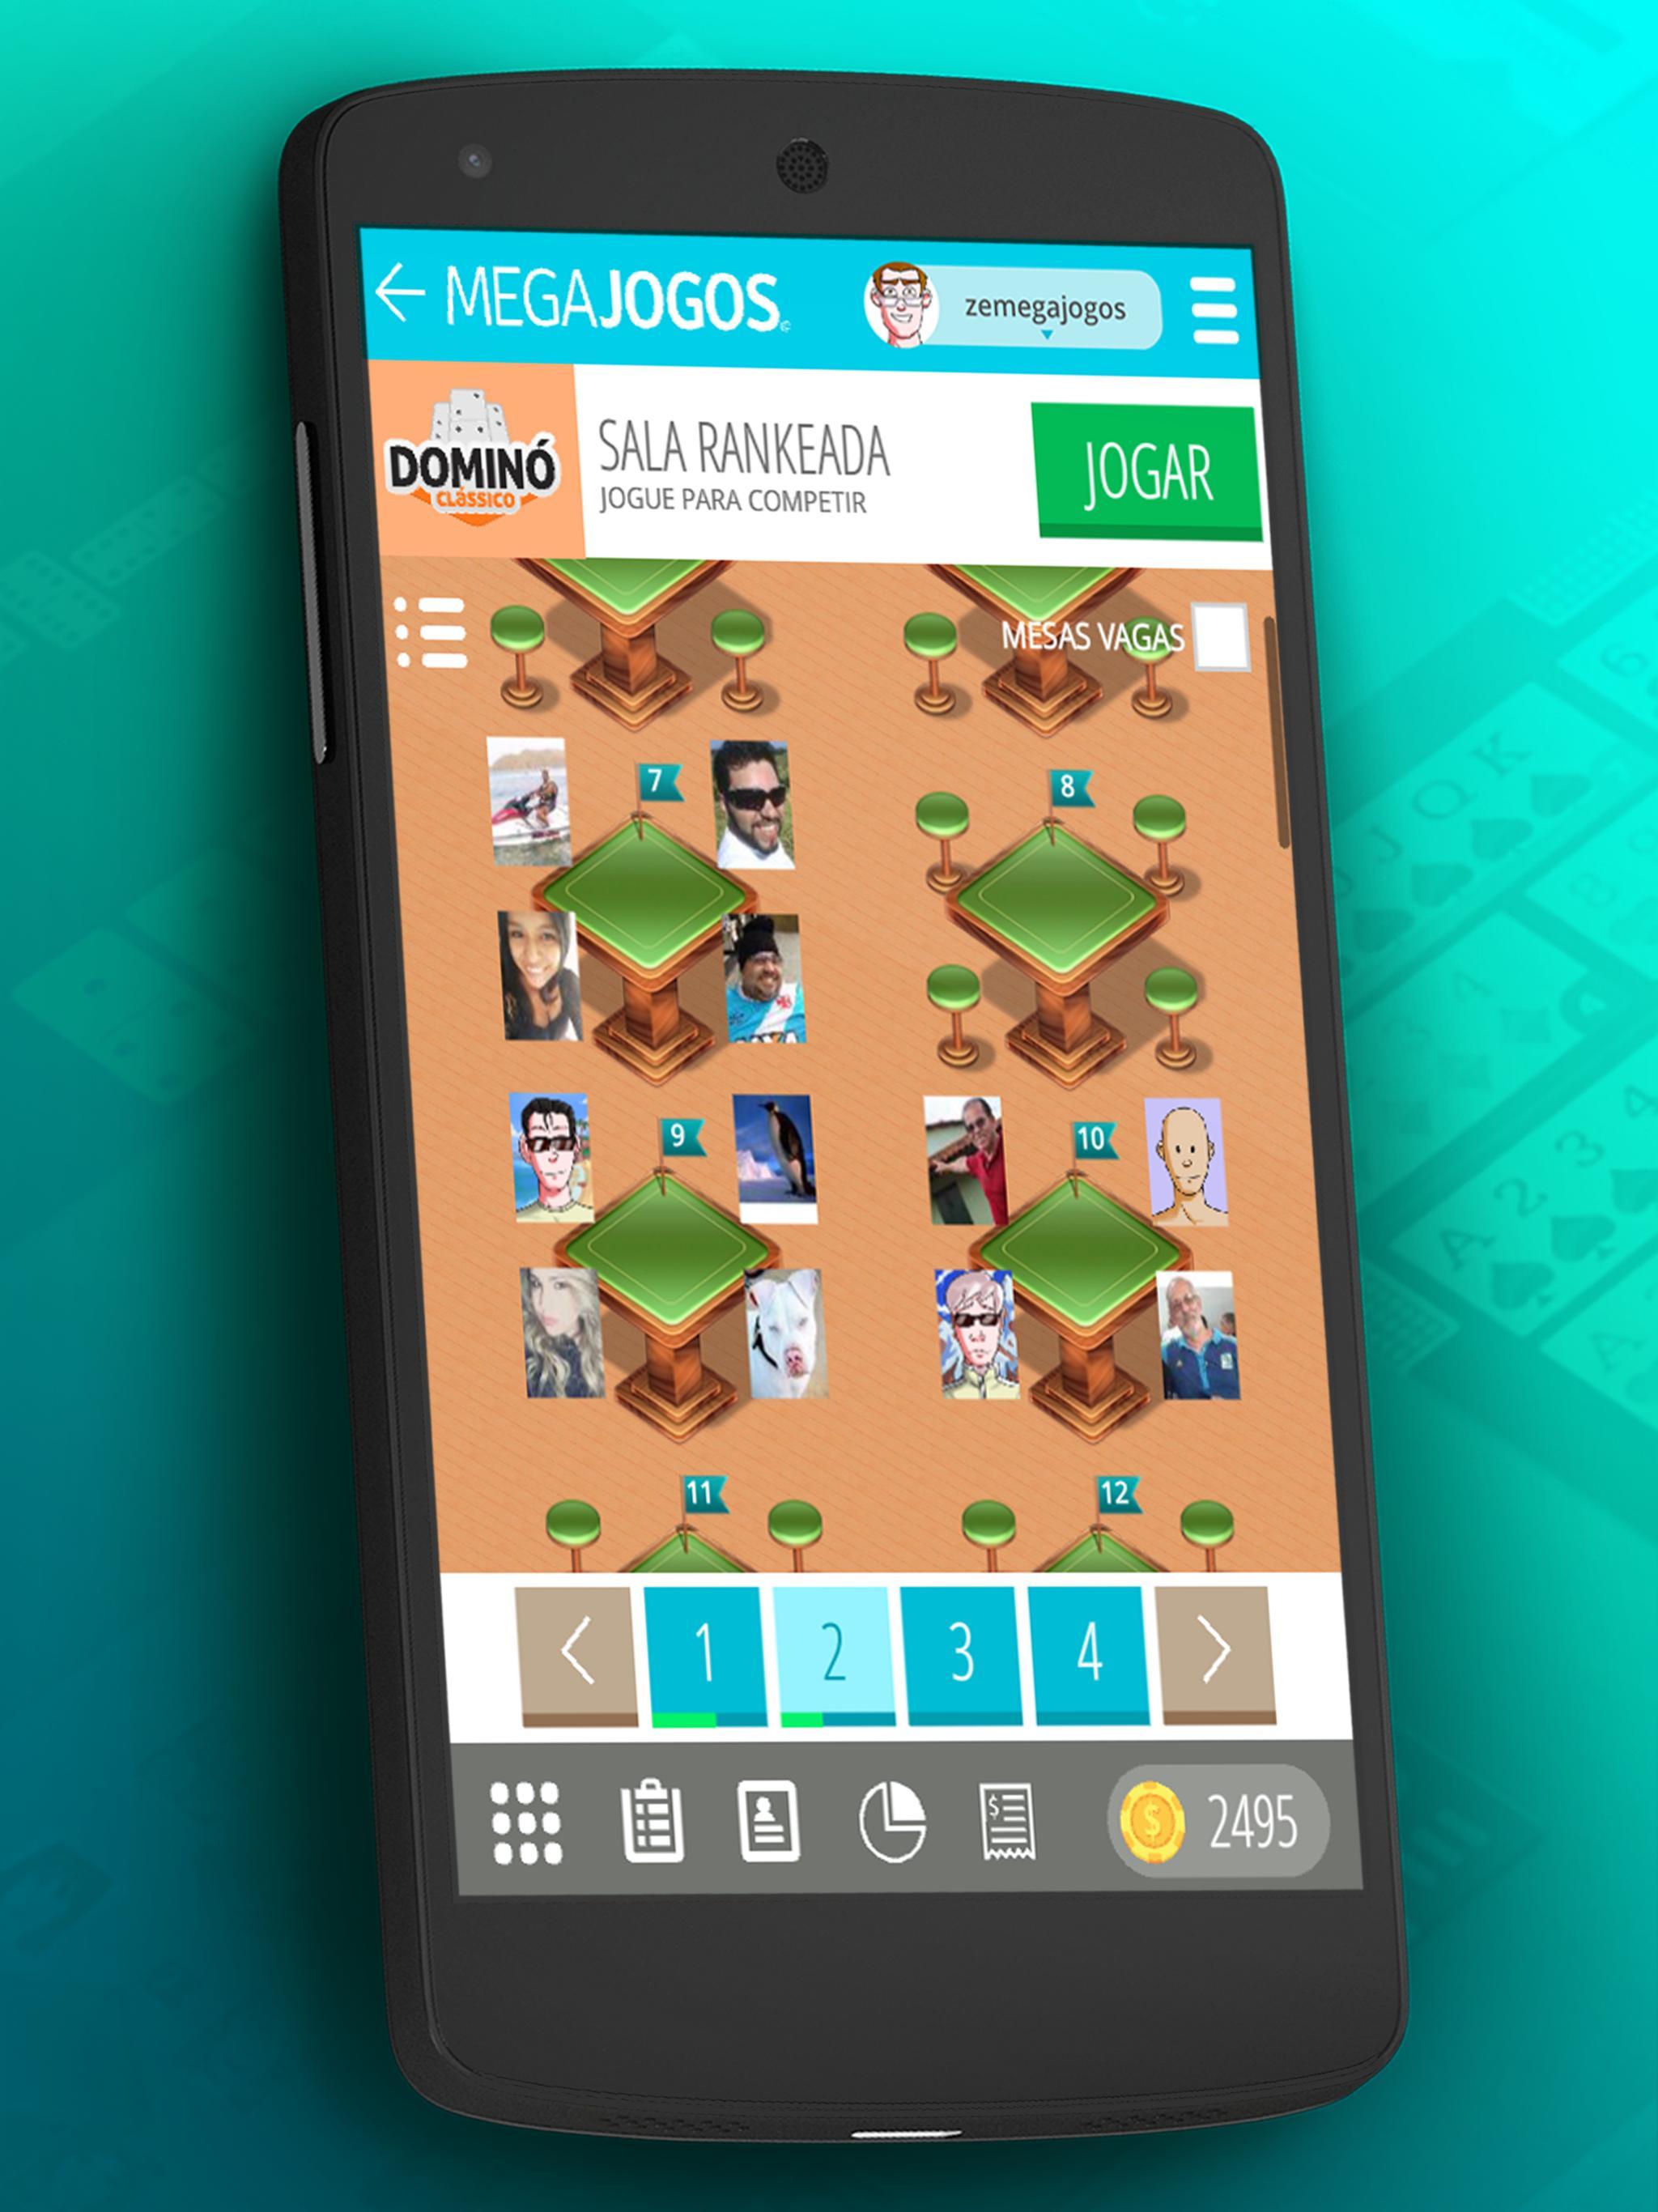 Dominoes Online - Free game 101.1.71 Screenshot 5